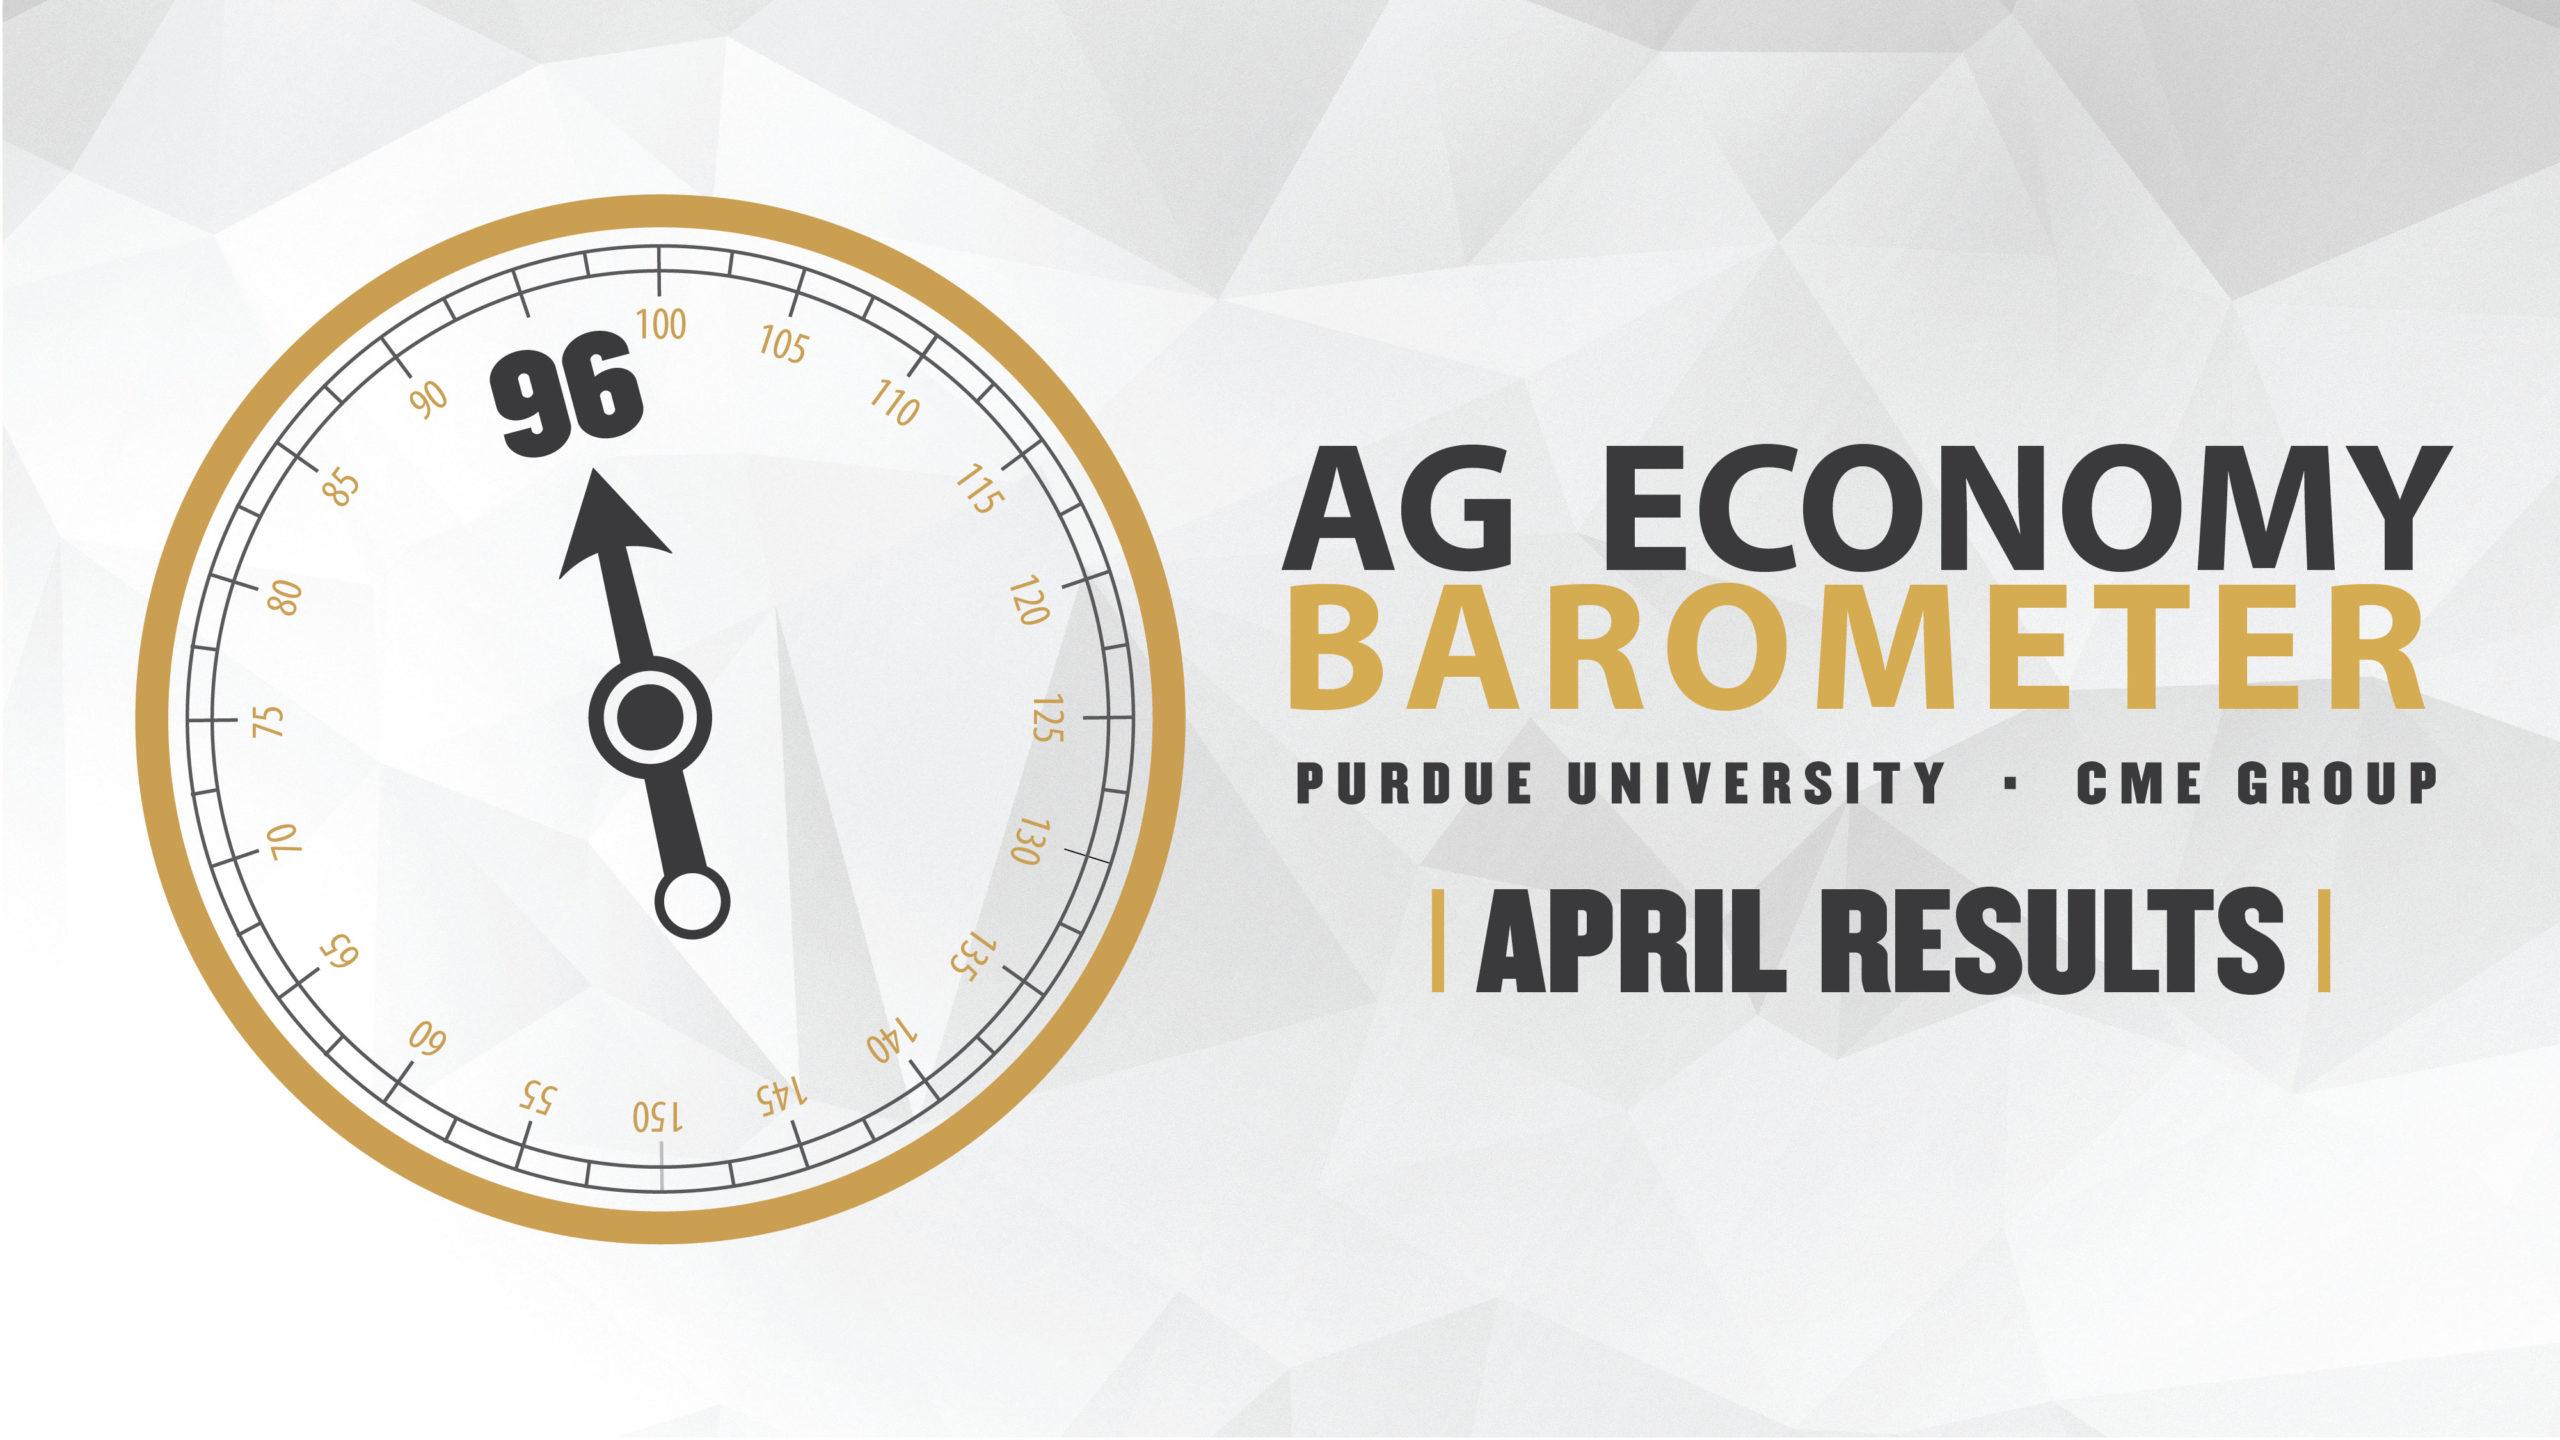 Ag Economy Barometer Widget April 2020: 96